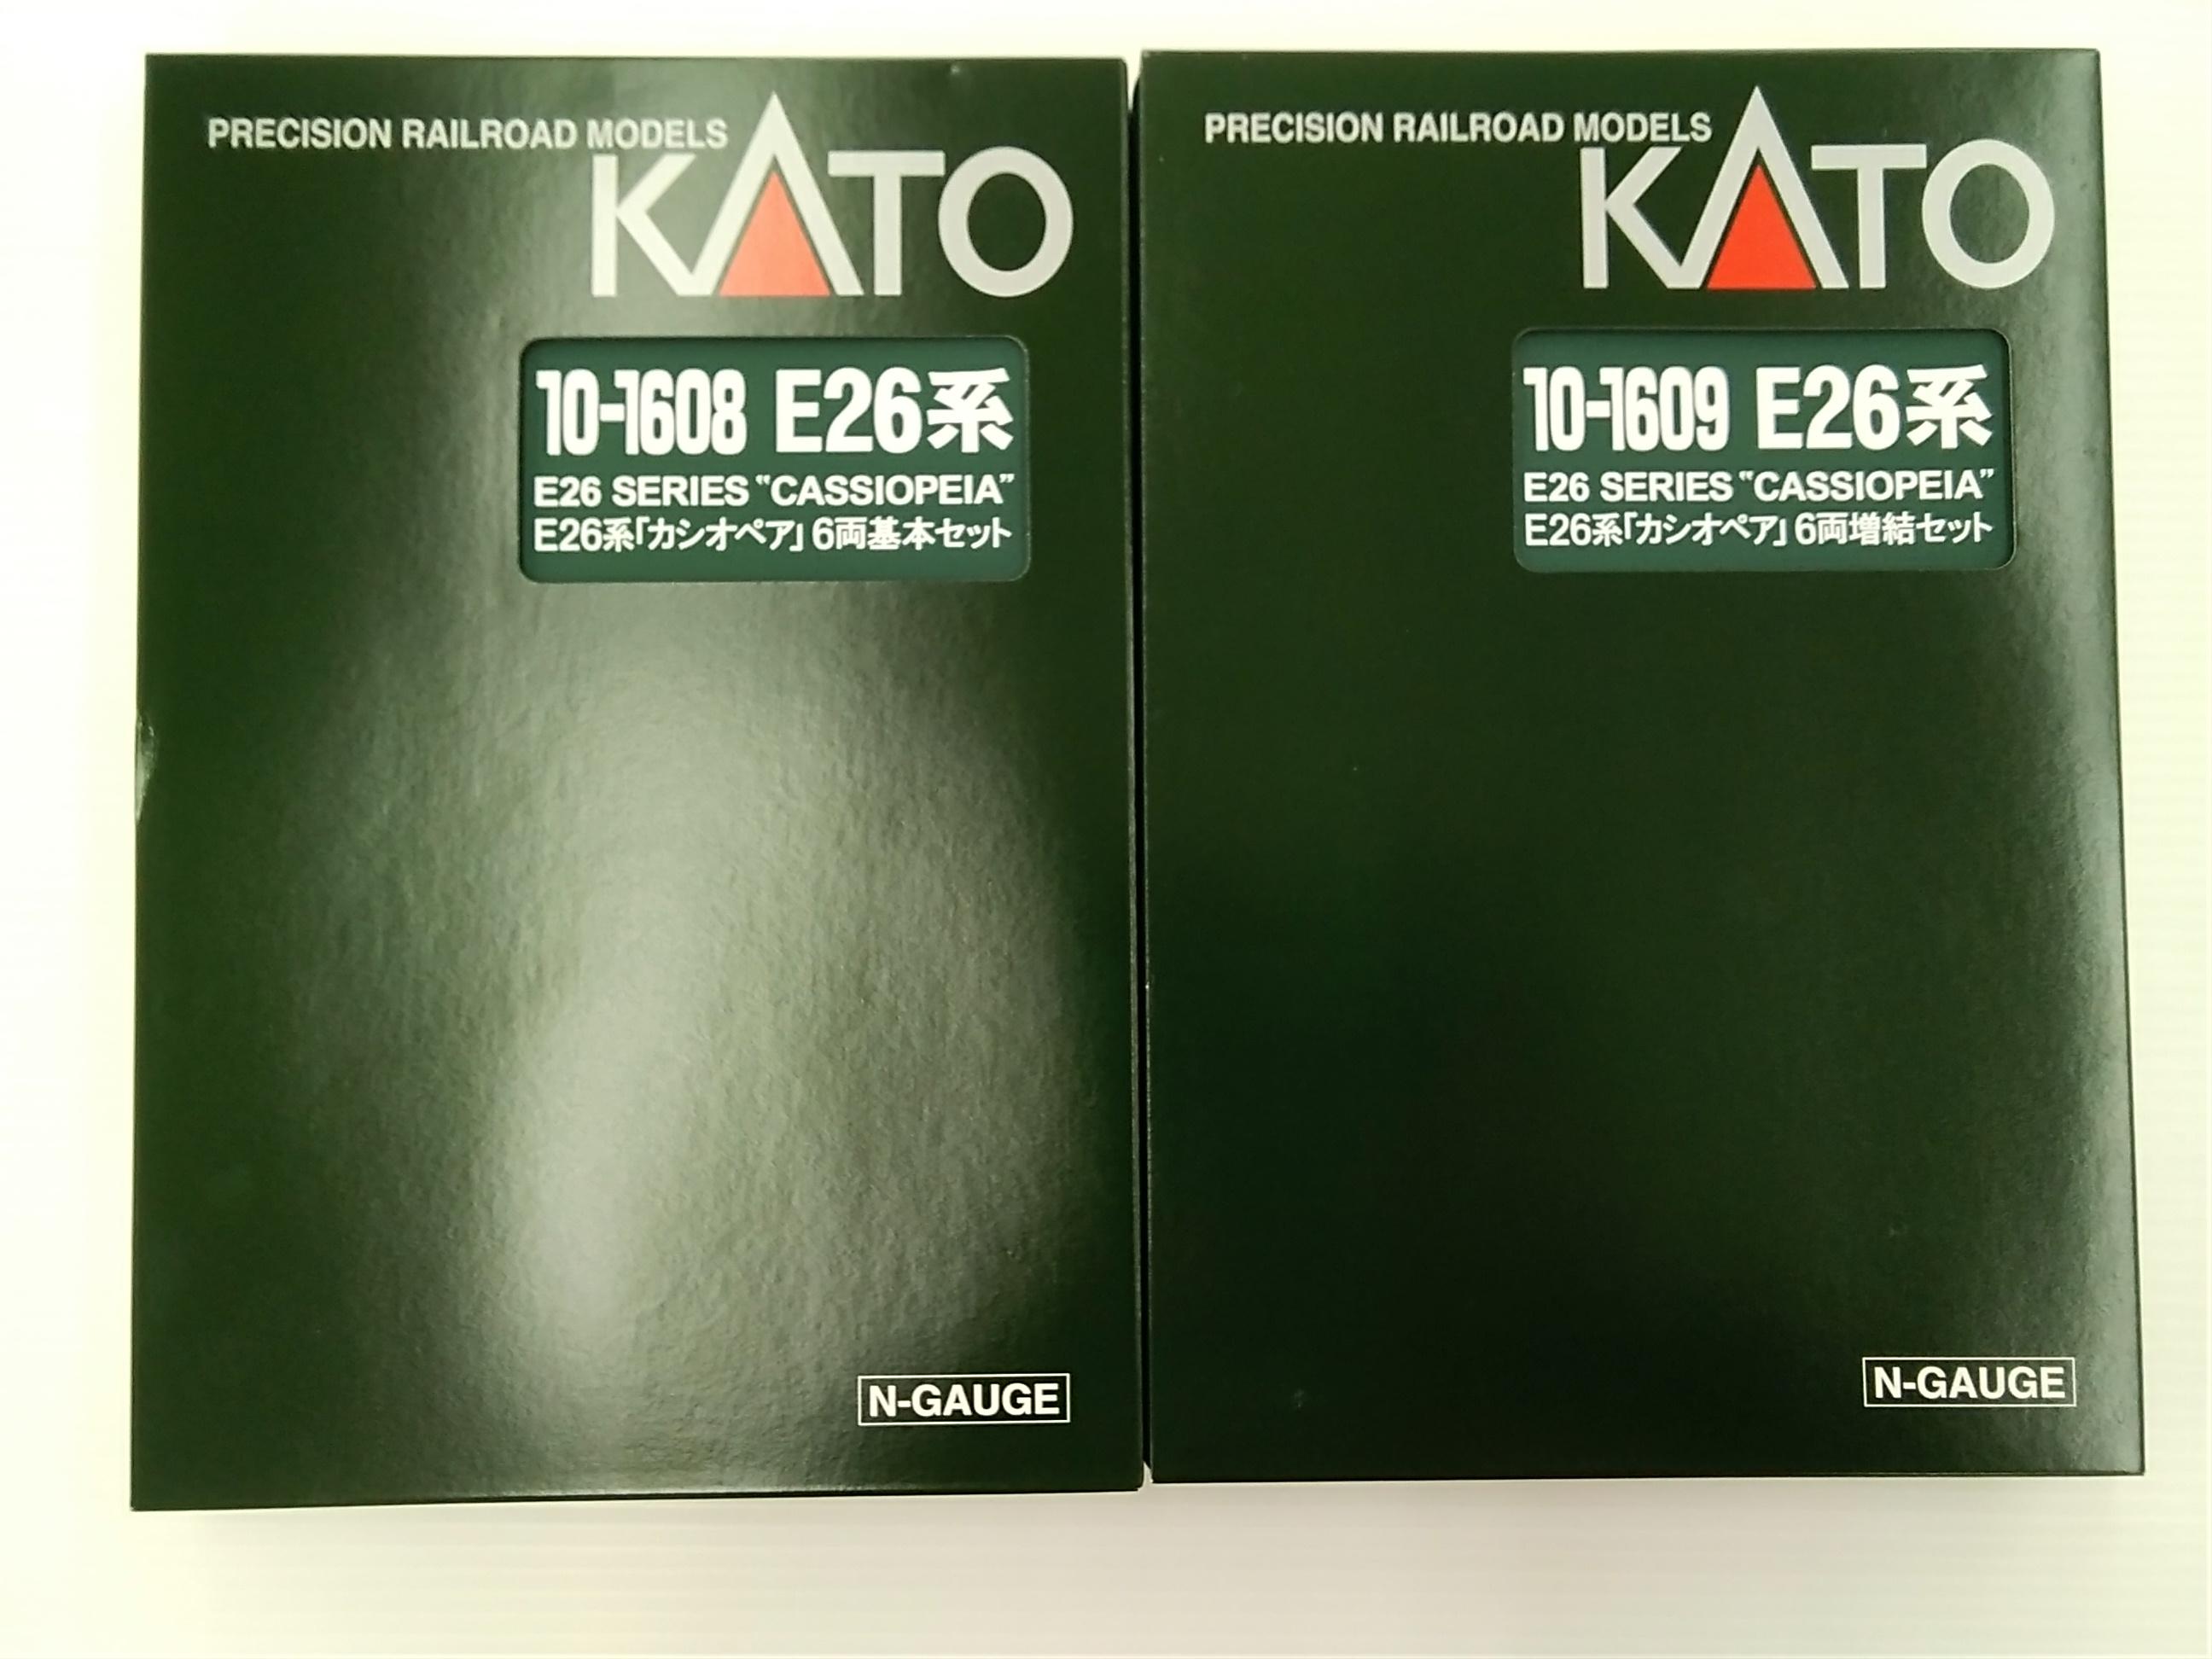 E26系カシオペア 基本増結セット|KATO